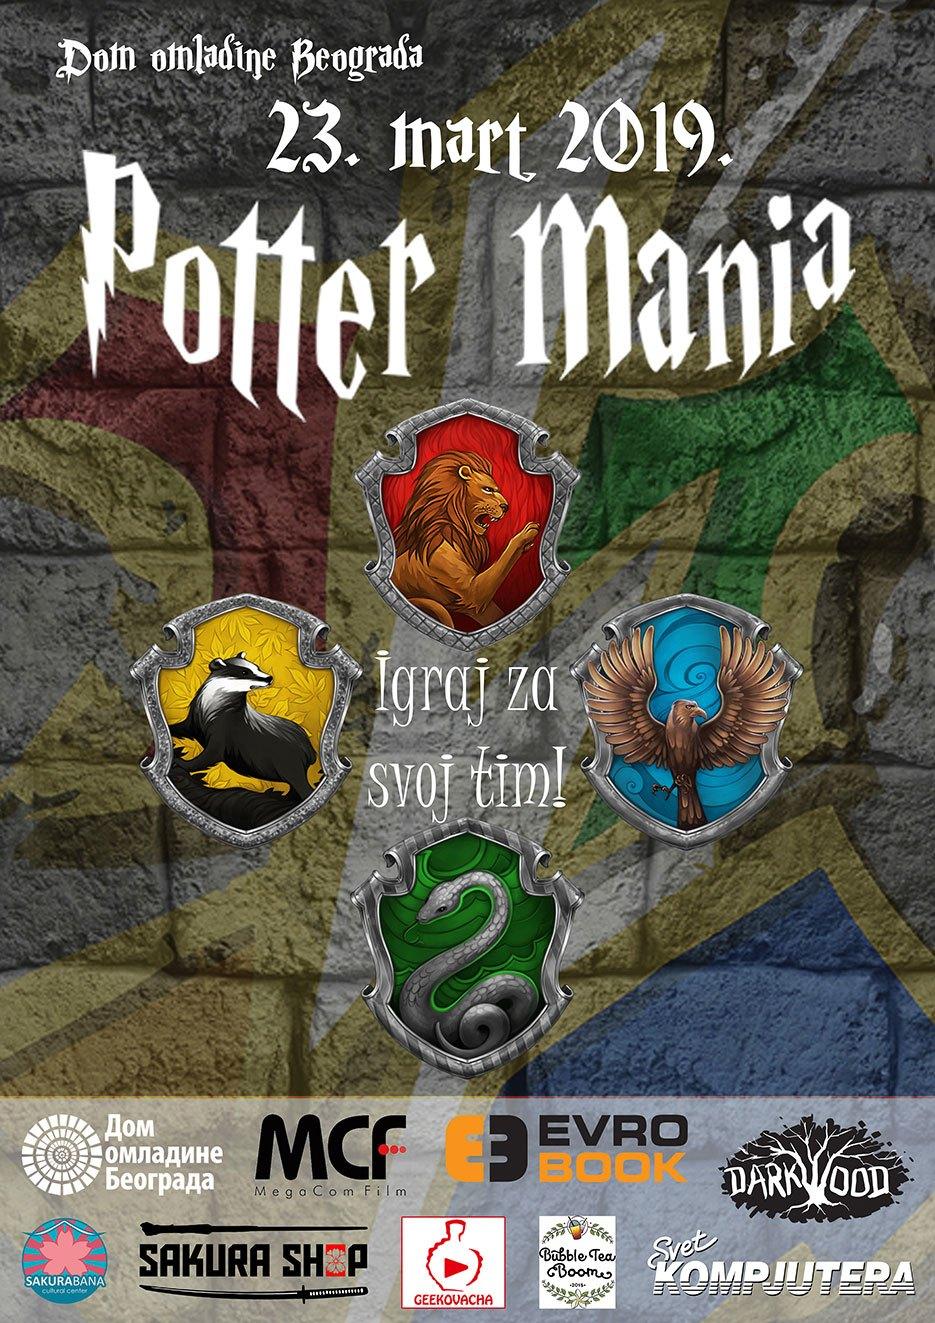 Pottermania